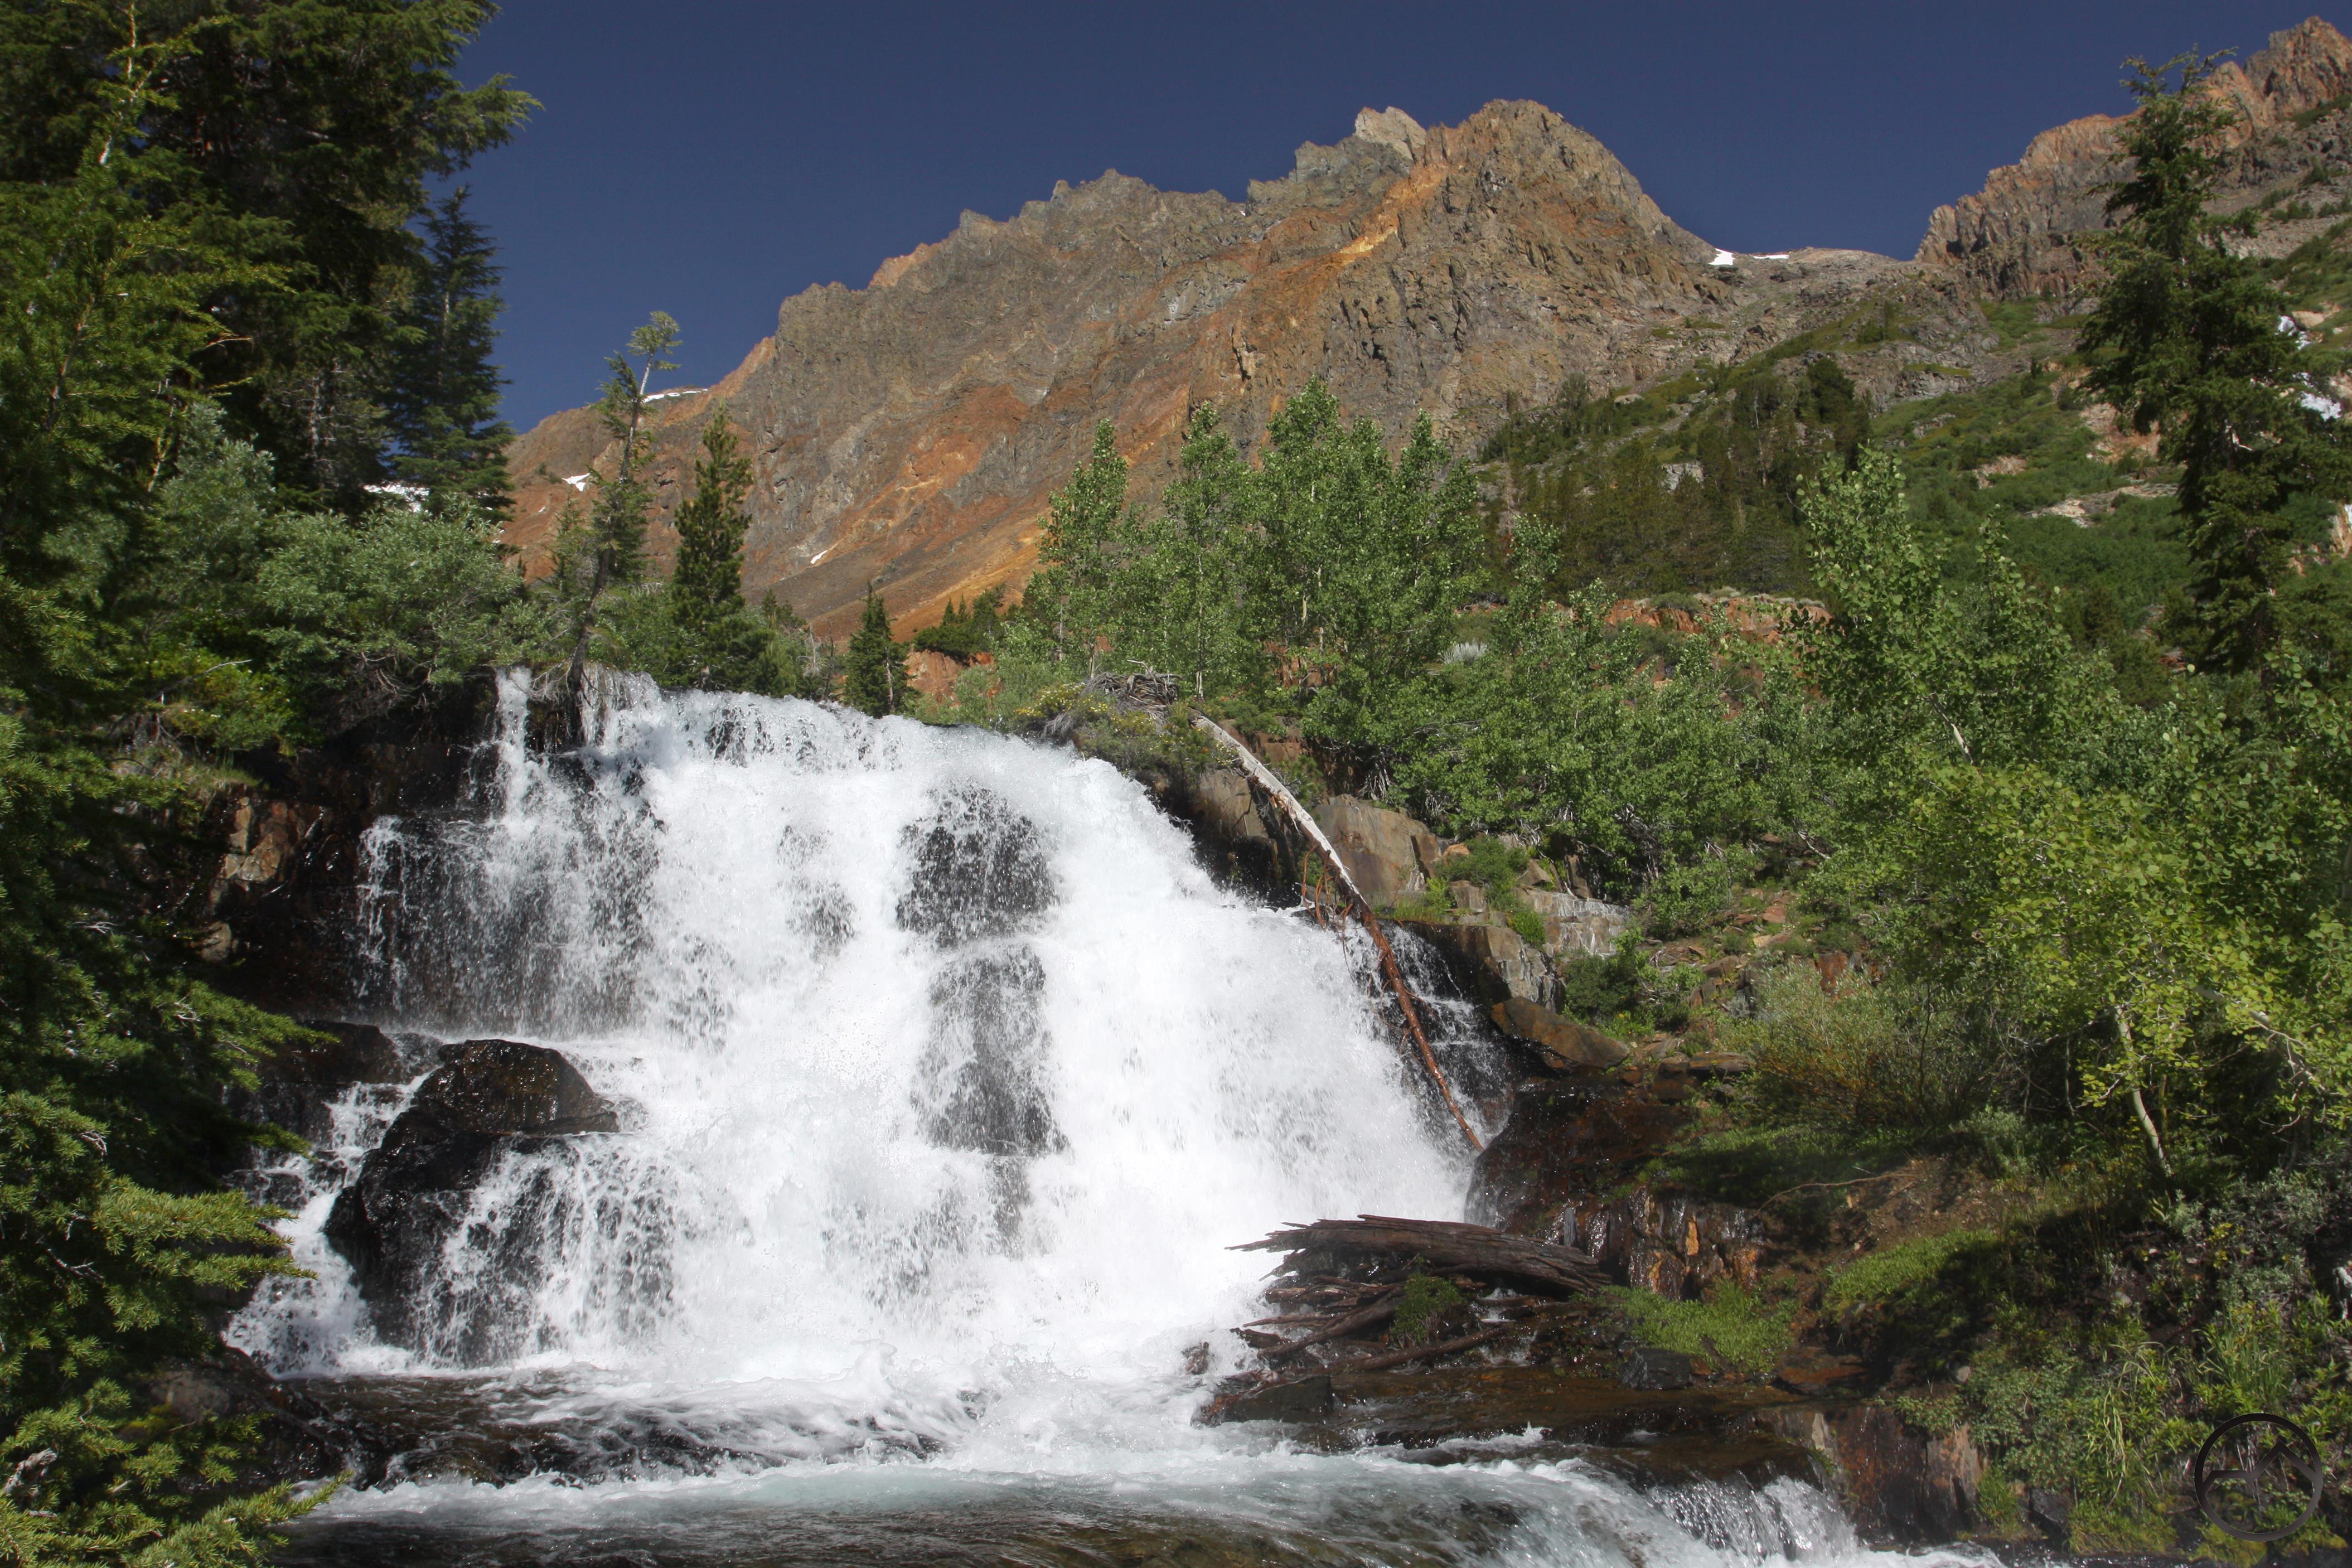 Hiking Hike Mt Shasta